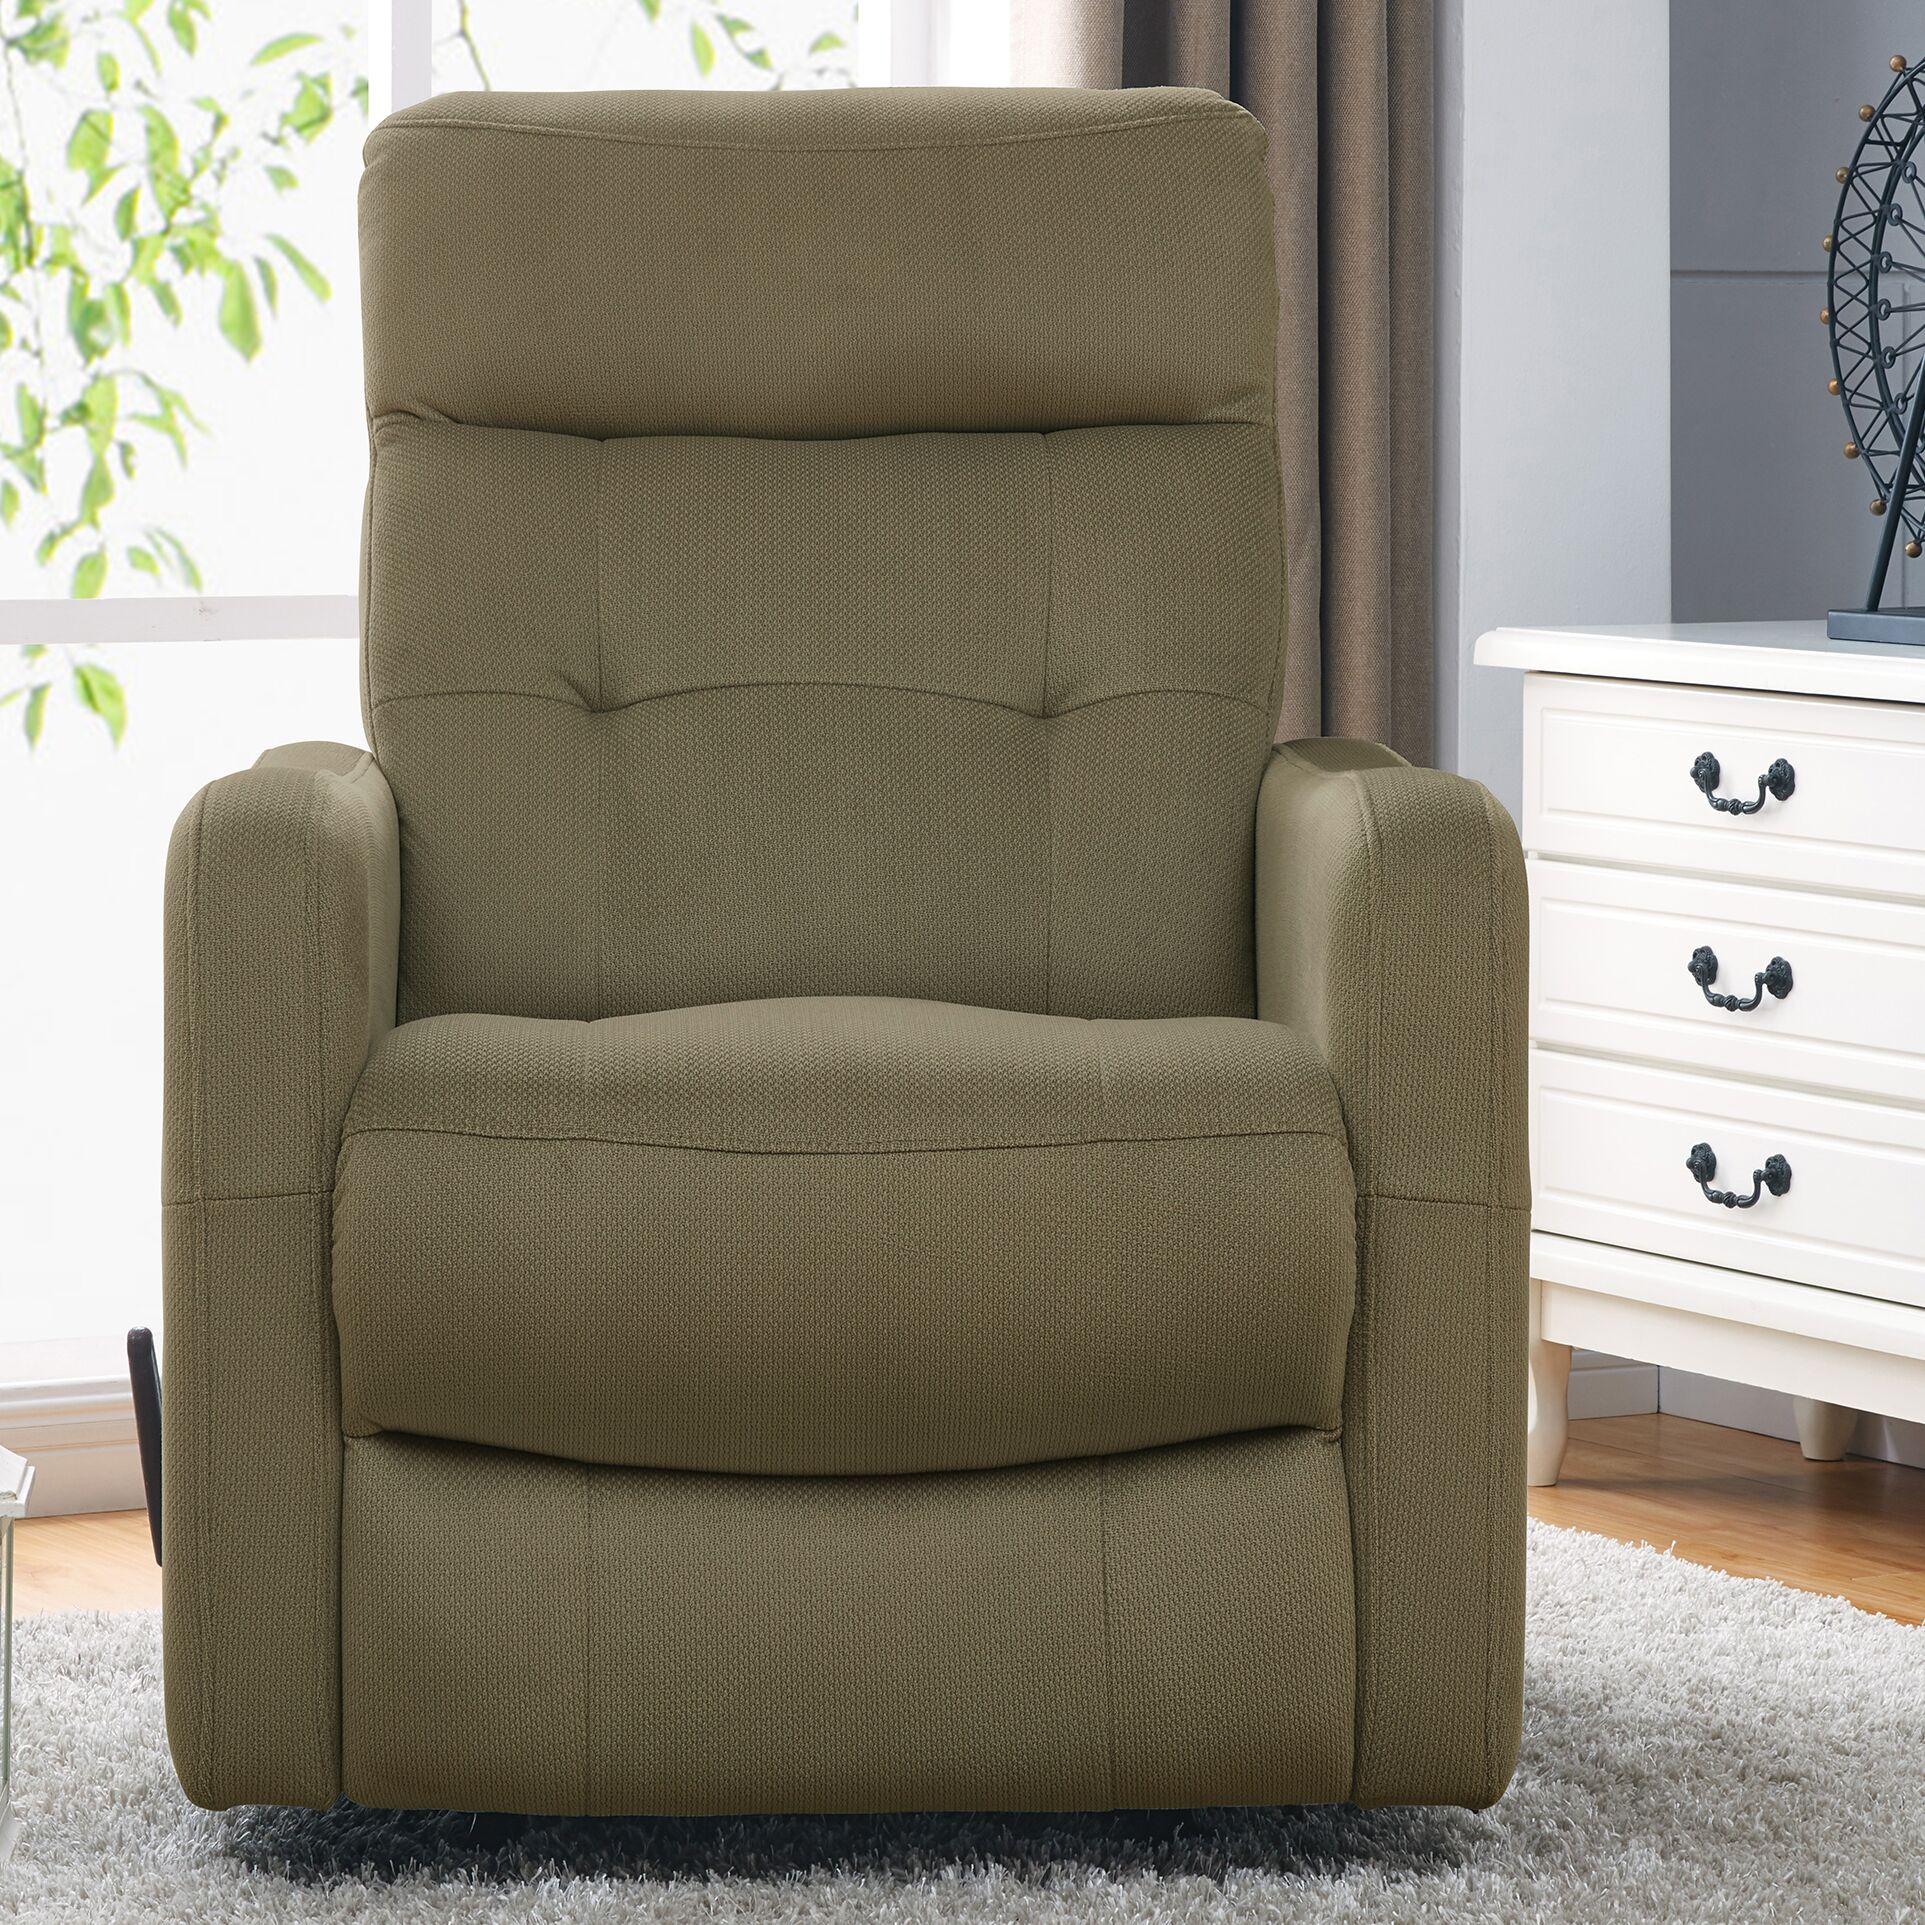 Minogue Manual Rocker Recliner Upholstery: Sage